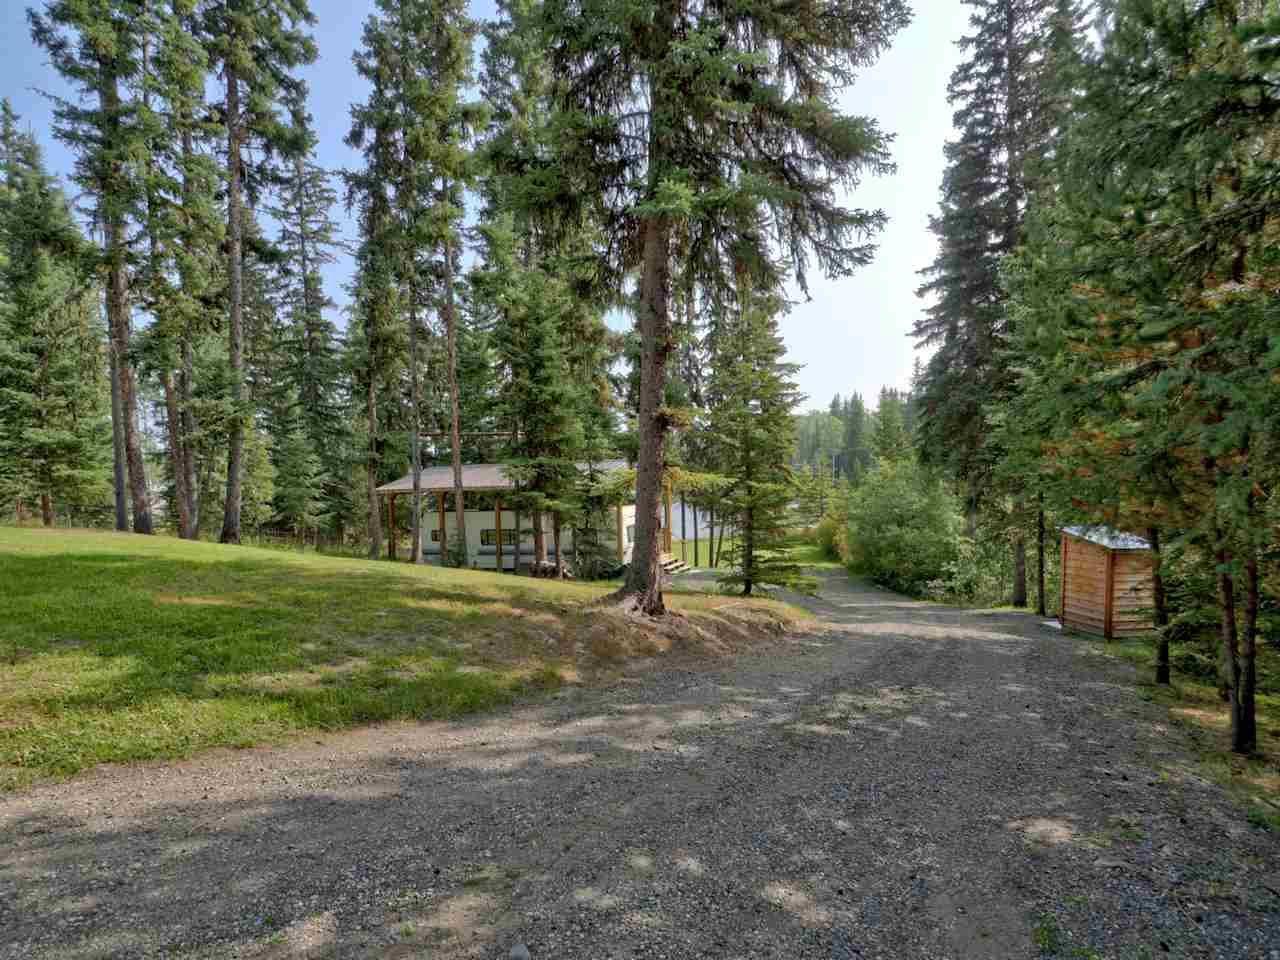 Photo 12: Photos: 7271 NATH Road in Bridge Lake: Bridge Lake/Sheridan Lake Land for sale (100 Mile House (Zone 10))  : MLS®# R2496086